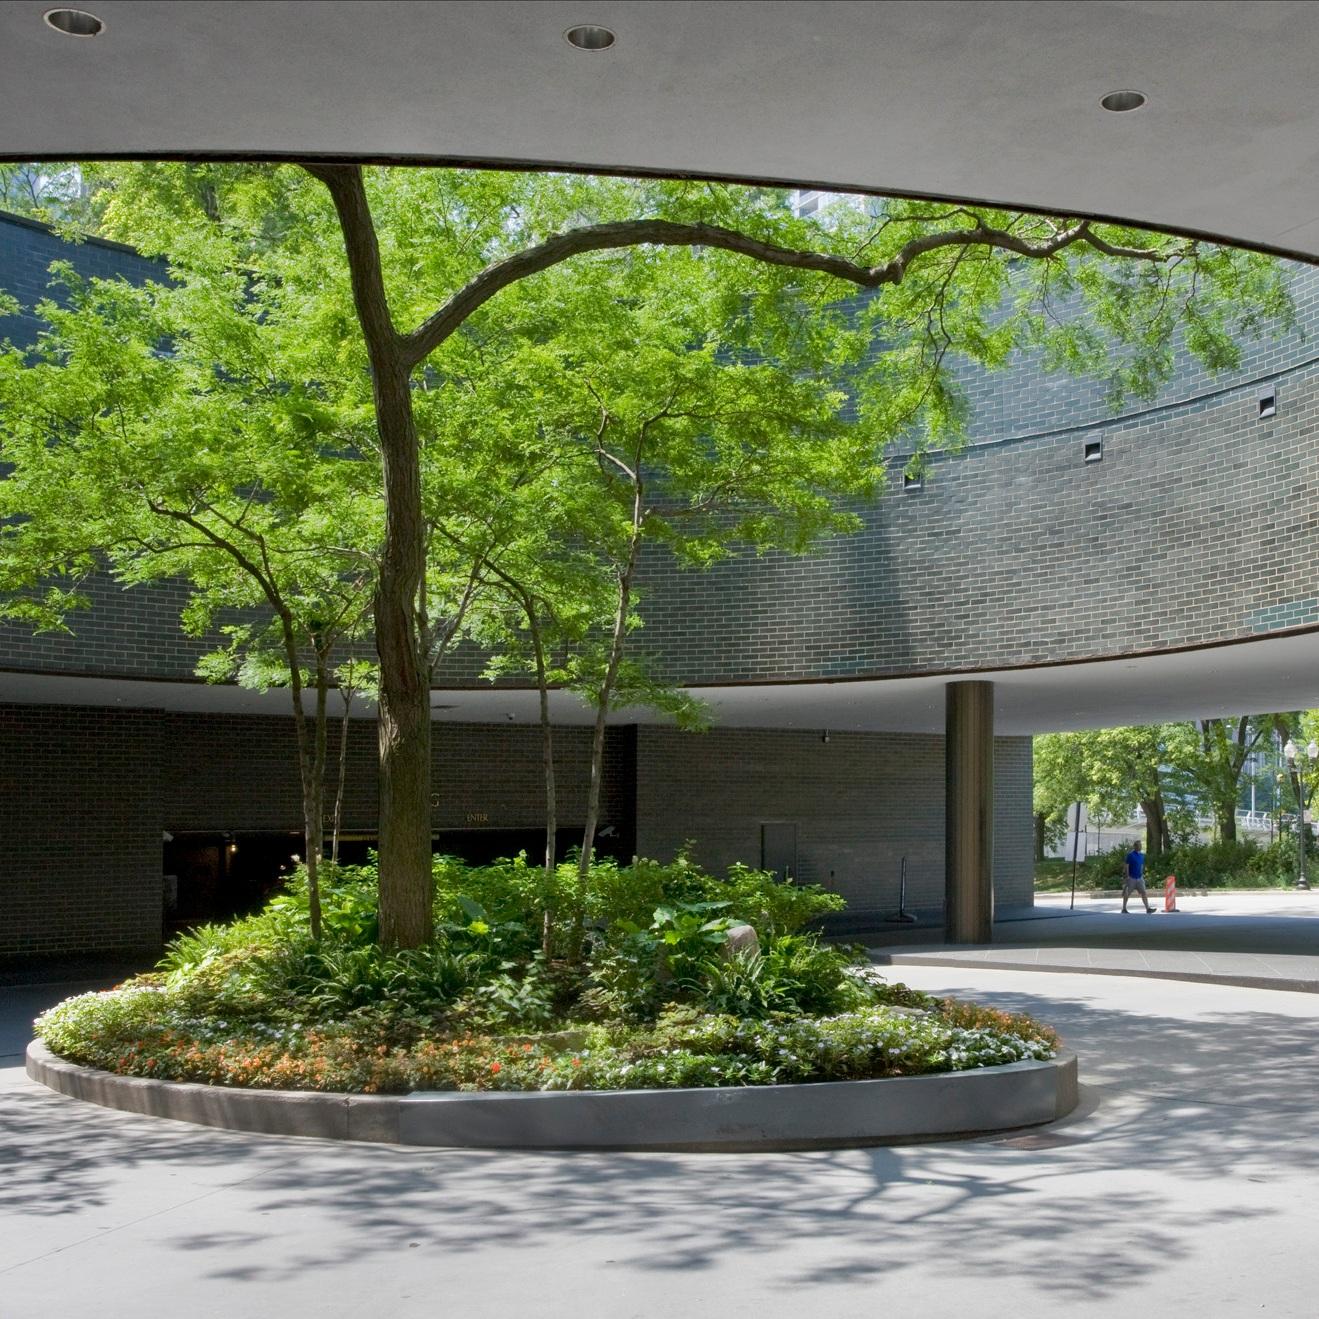 LAKE POINT TOWER  Landscape Enhancements + Maintenance  Chicago, Illinois